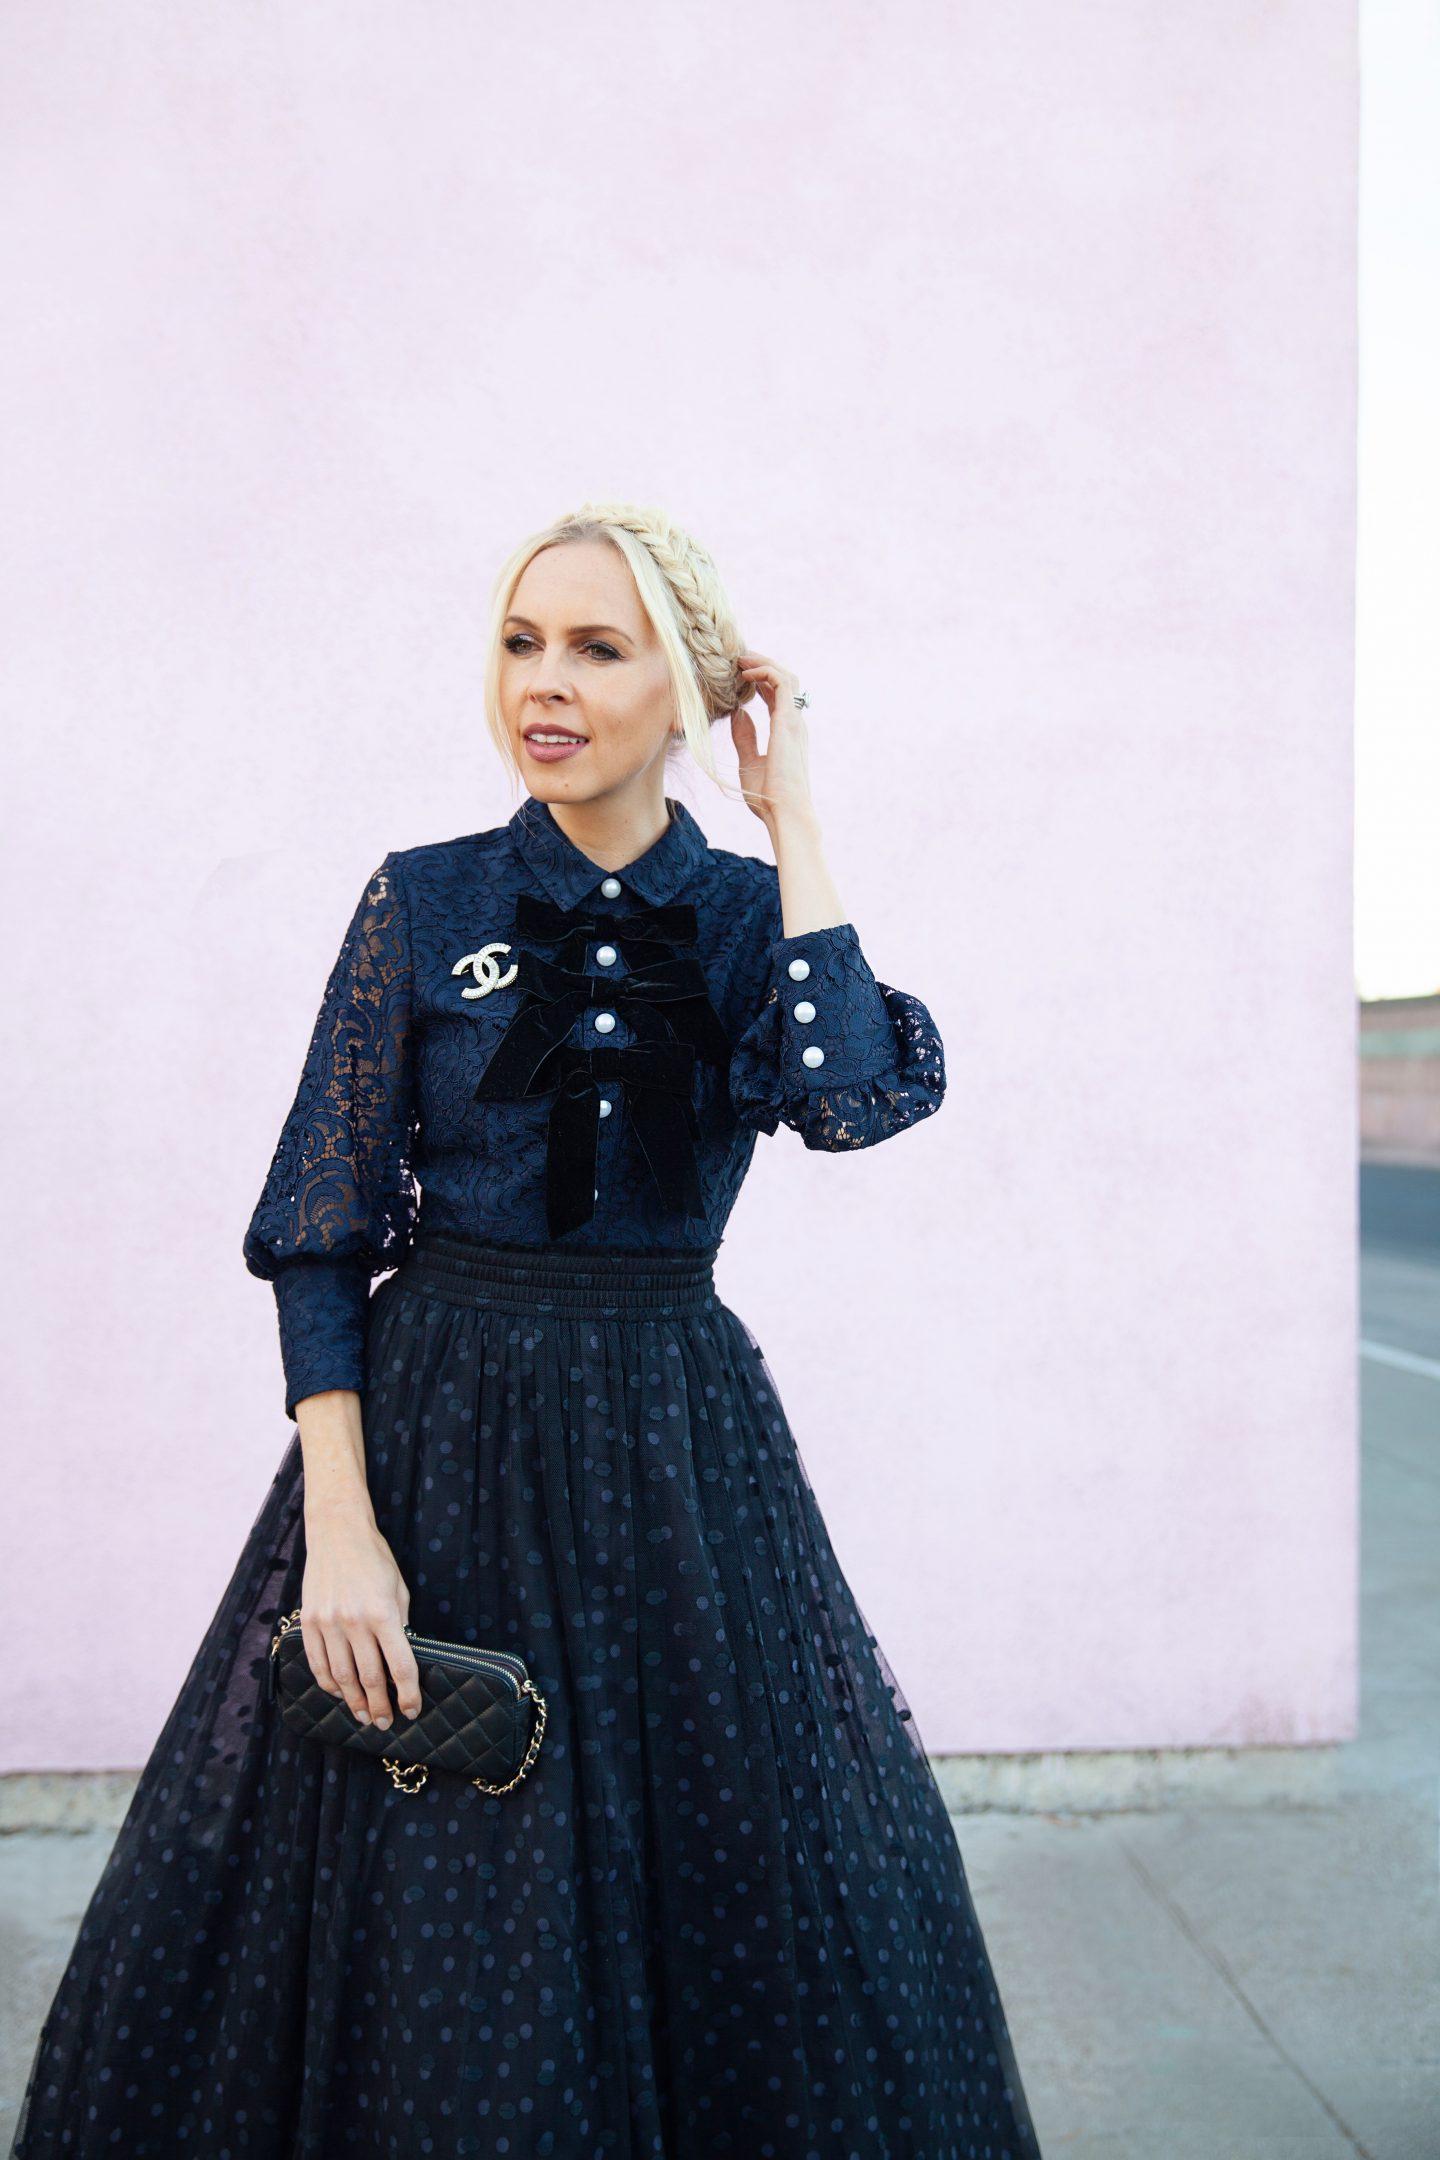 Blair Eadie Atlantic-Pacific x Halogen collection navy dress